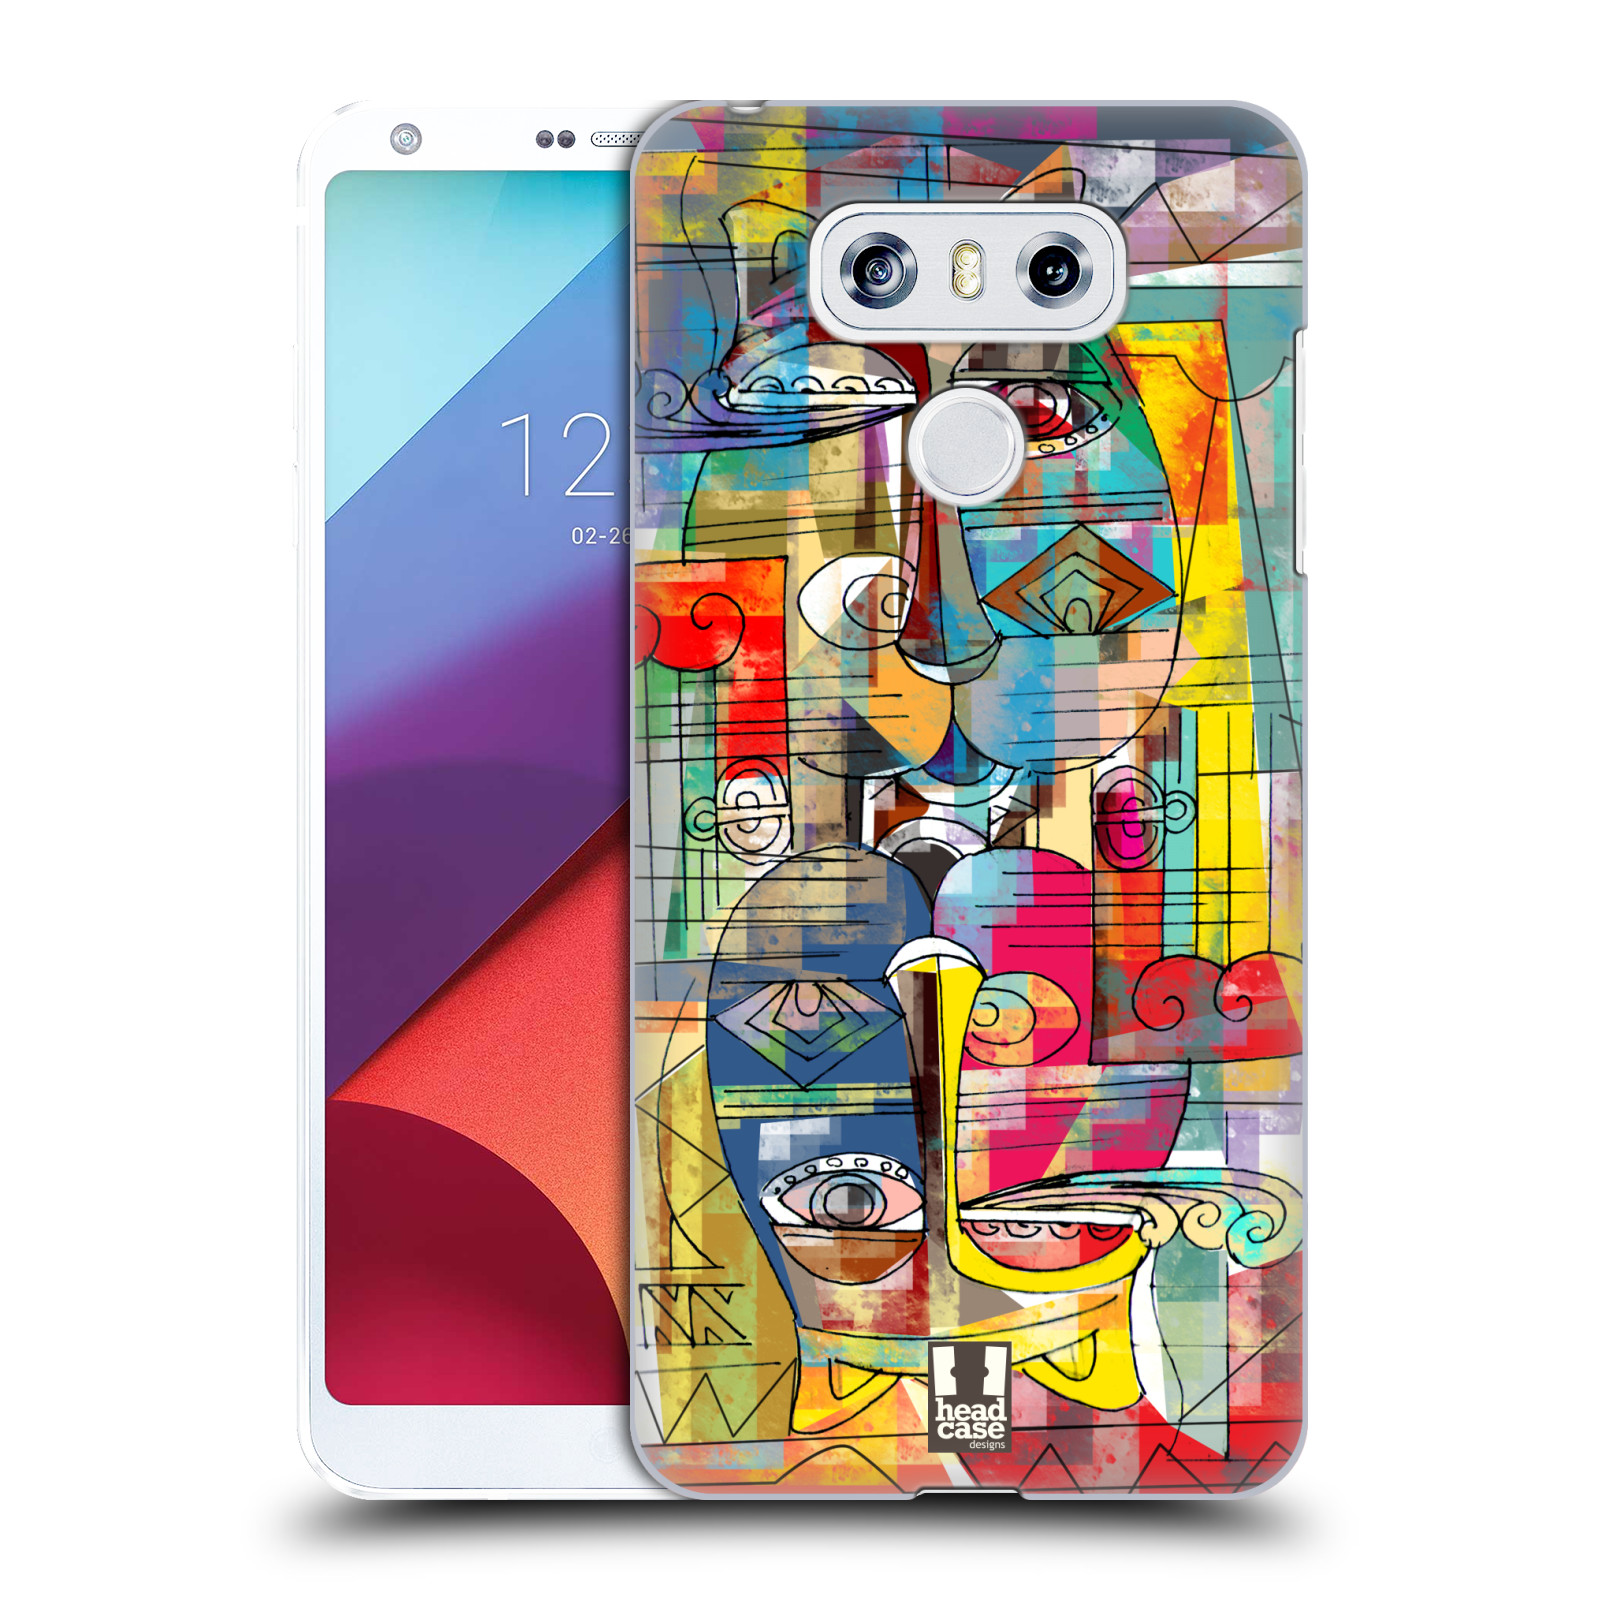 Plastové pouzdro na mobil LG G6 - Head Case AZTEC MANX